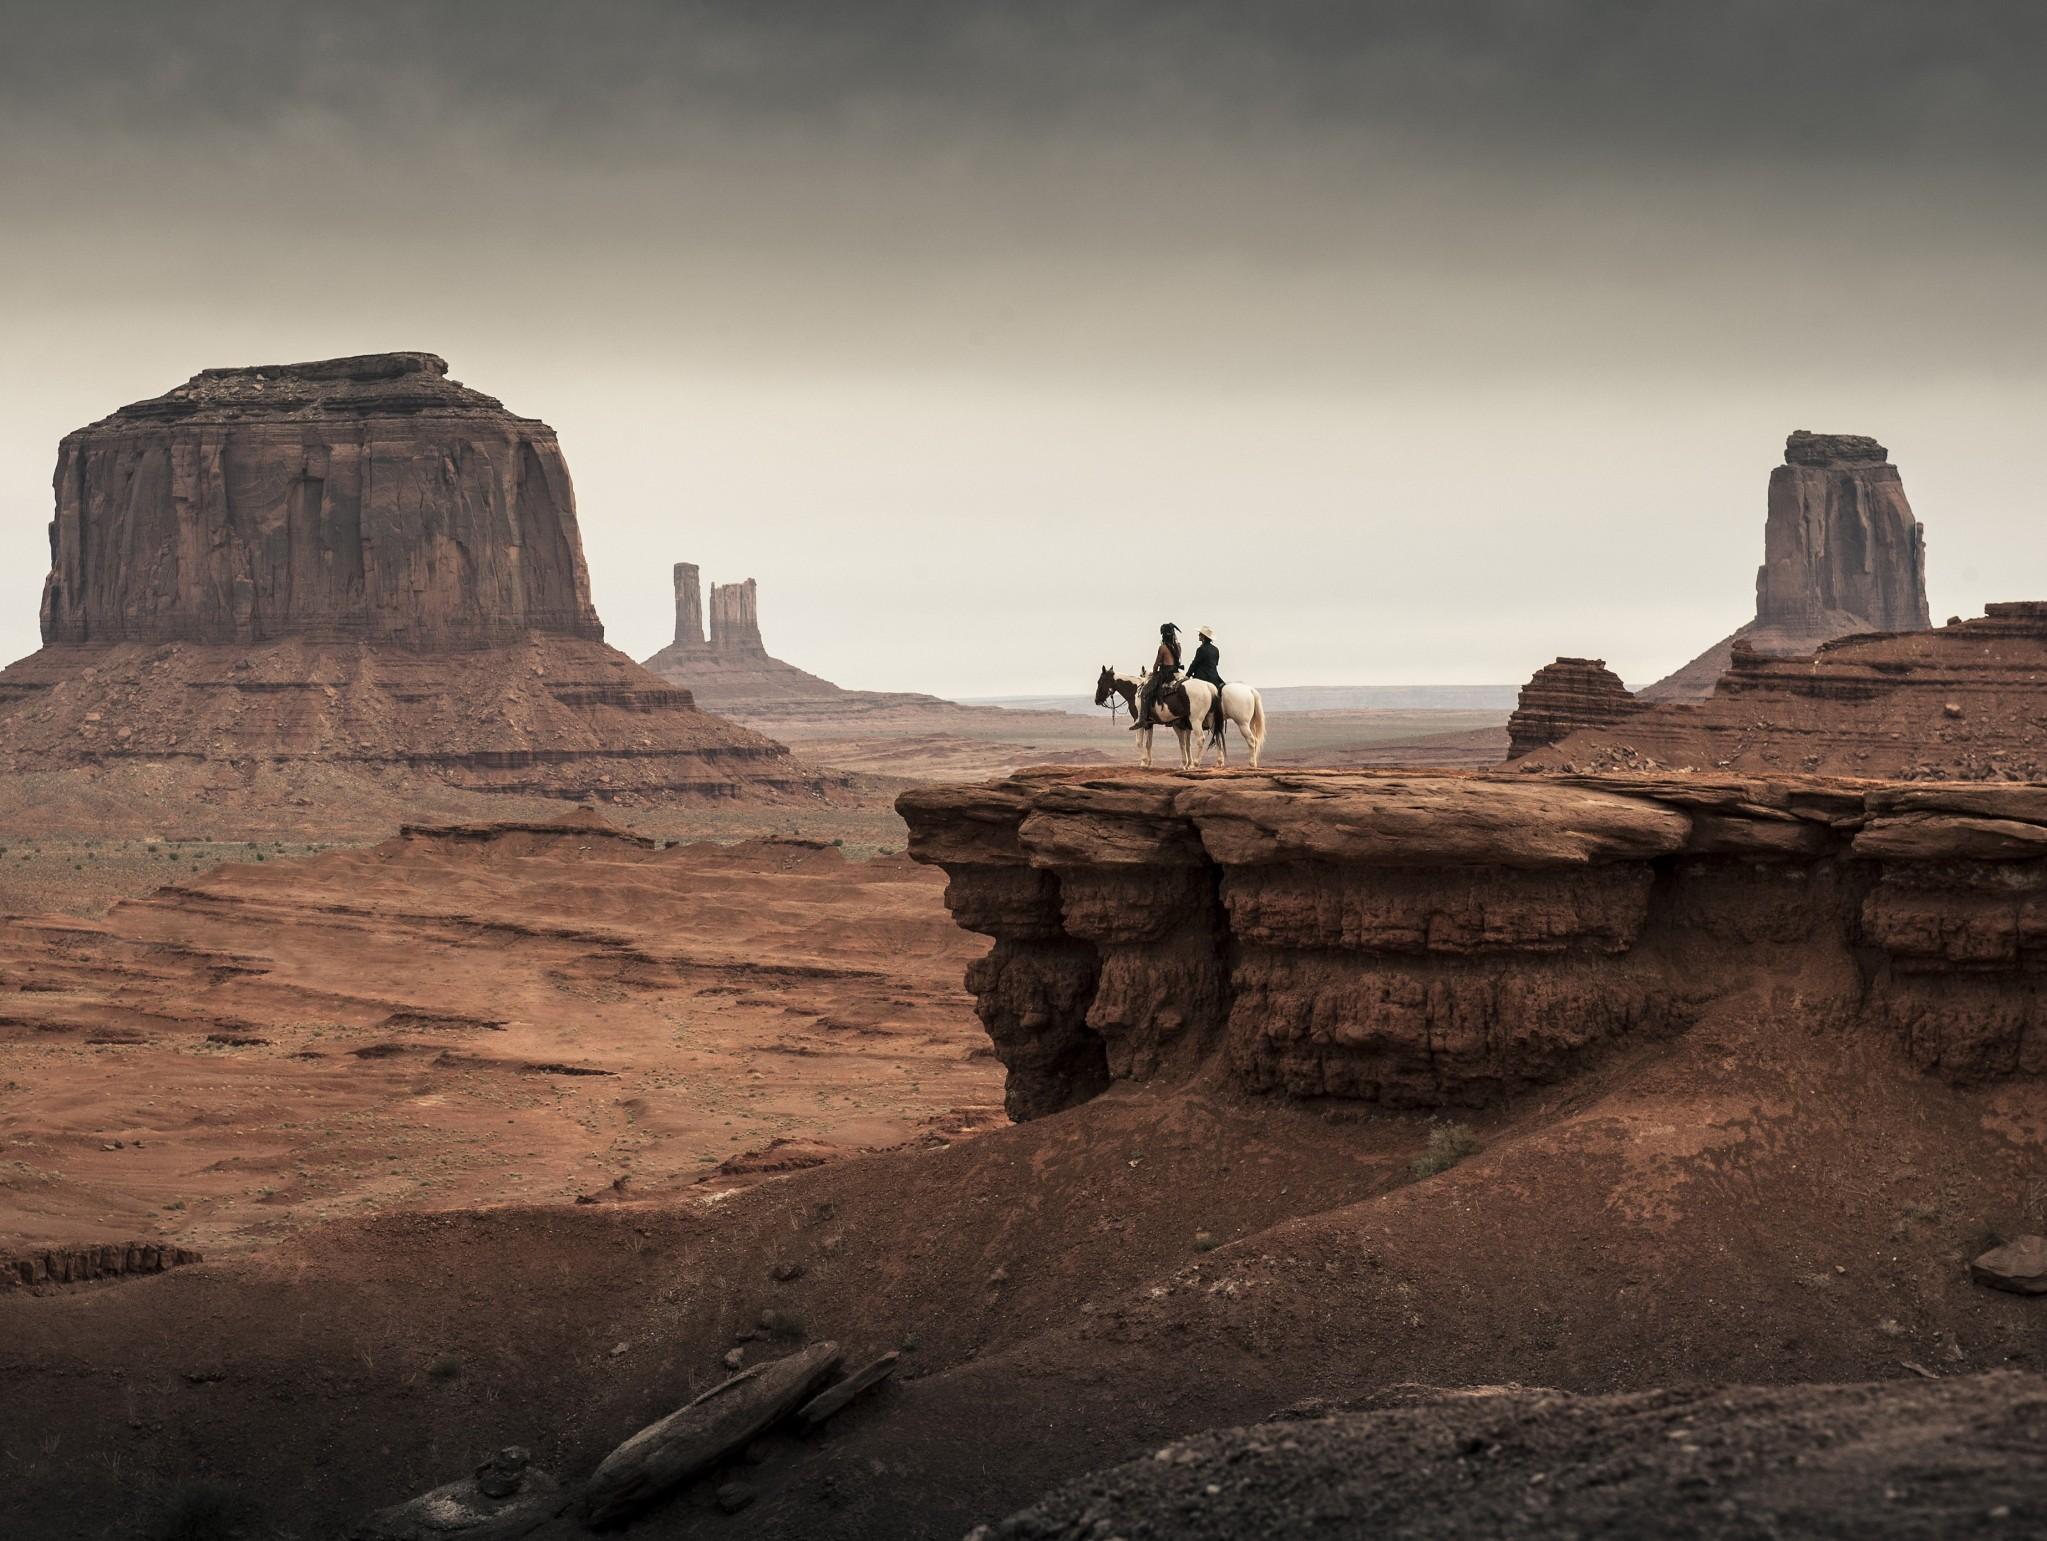 Lone Ranger Movie